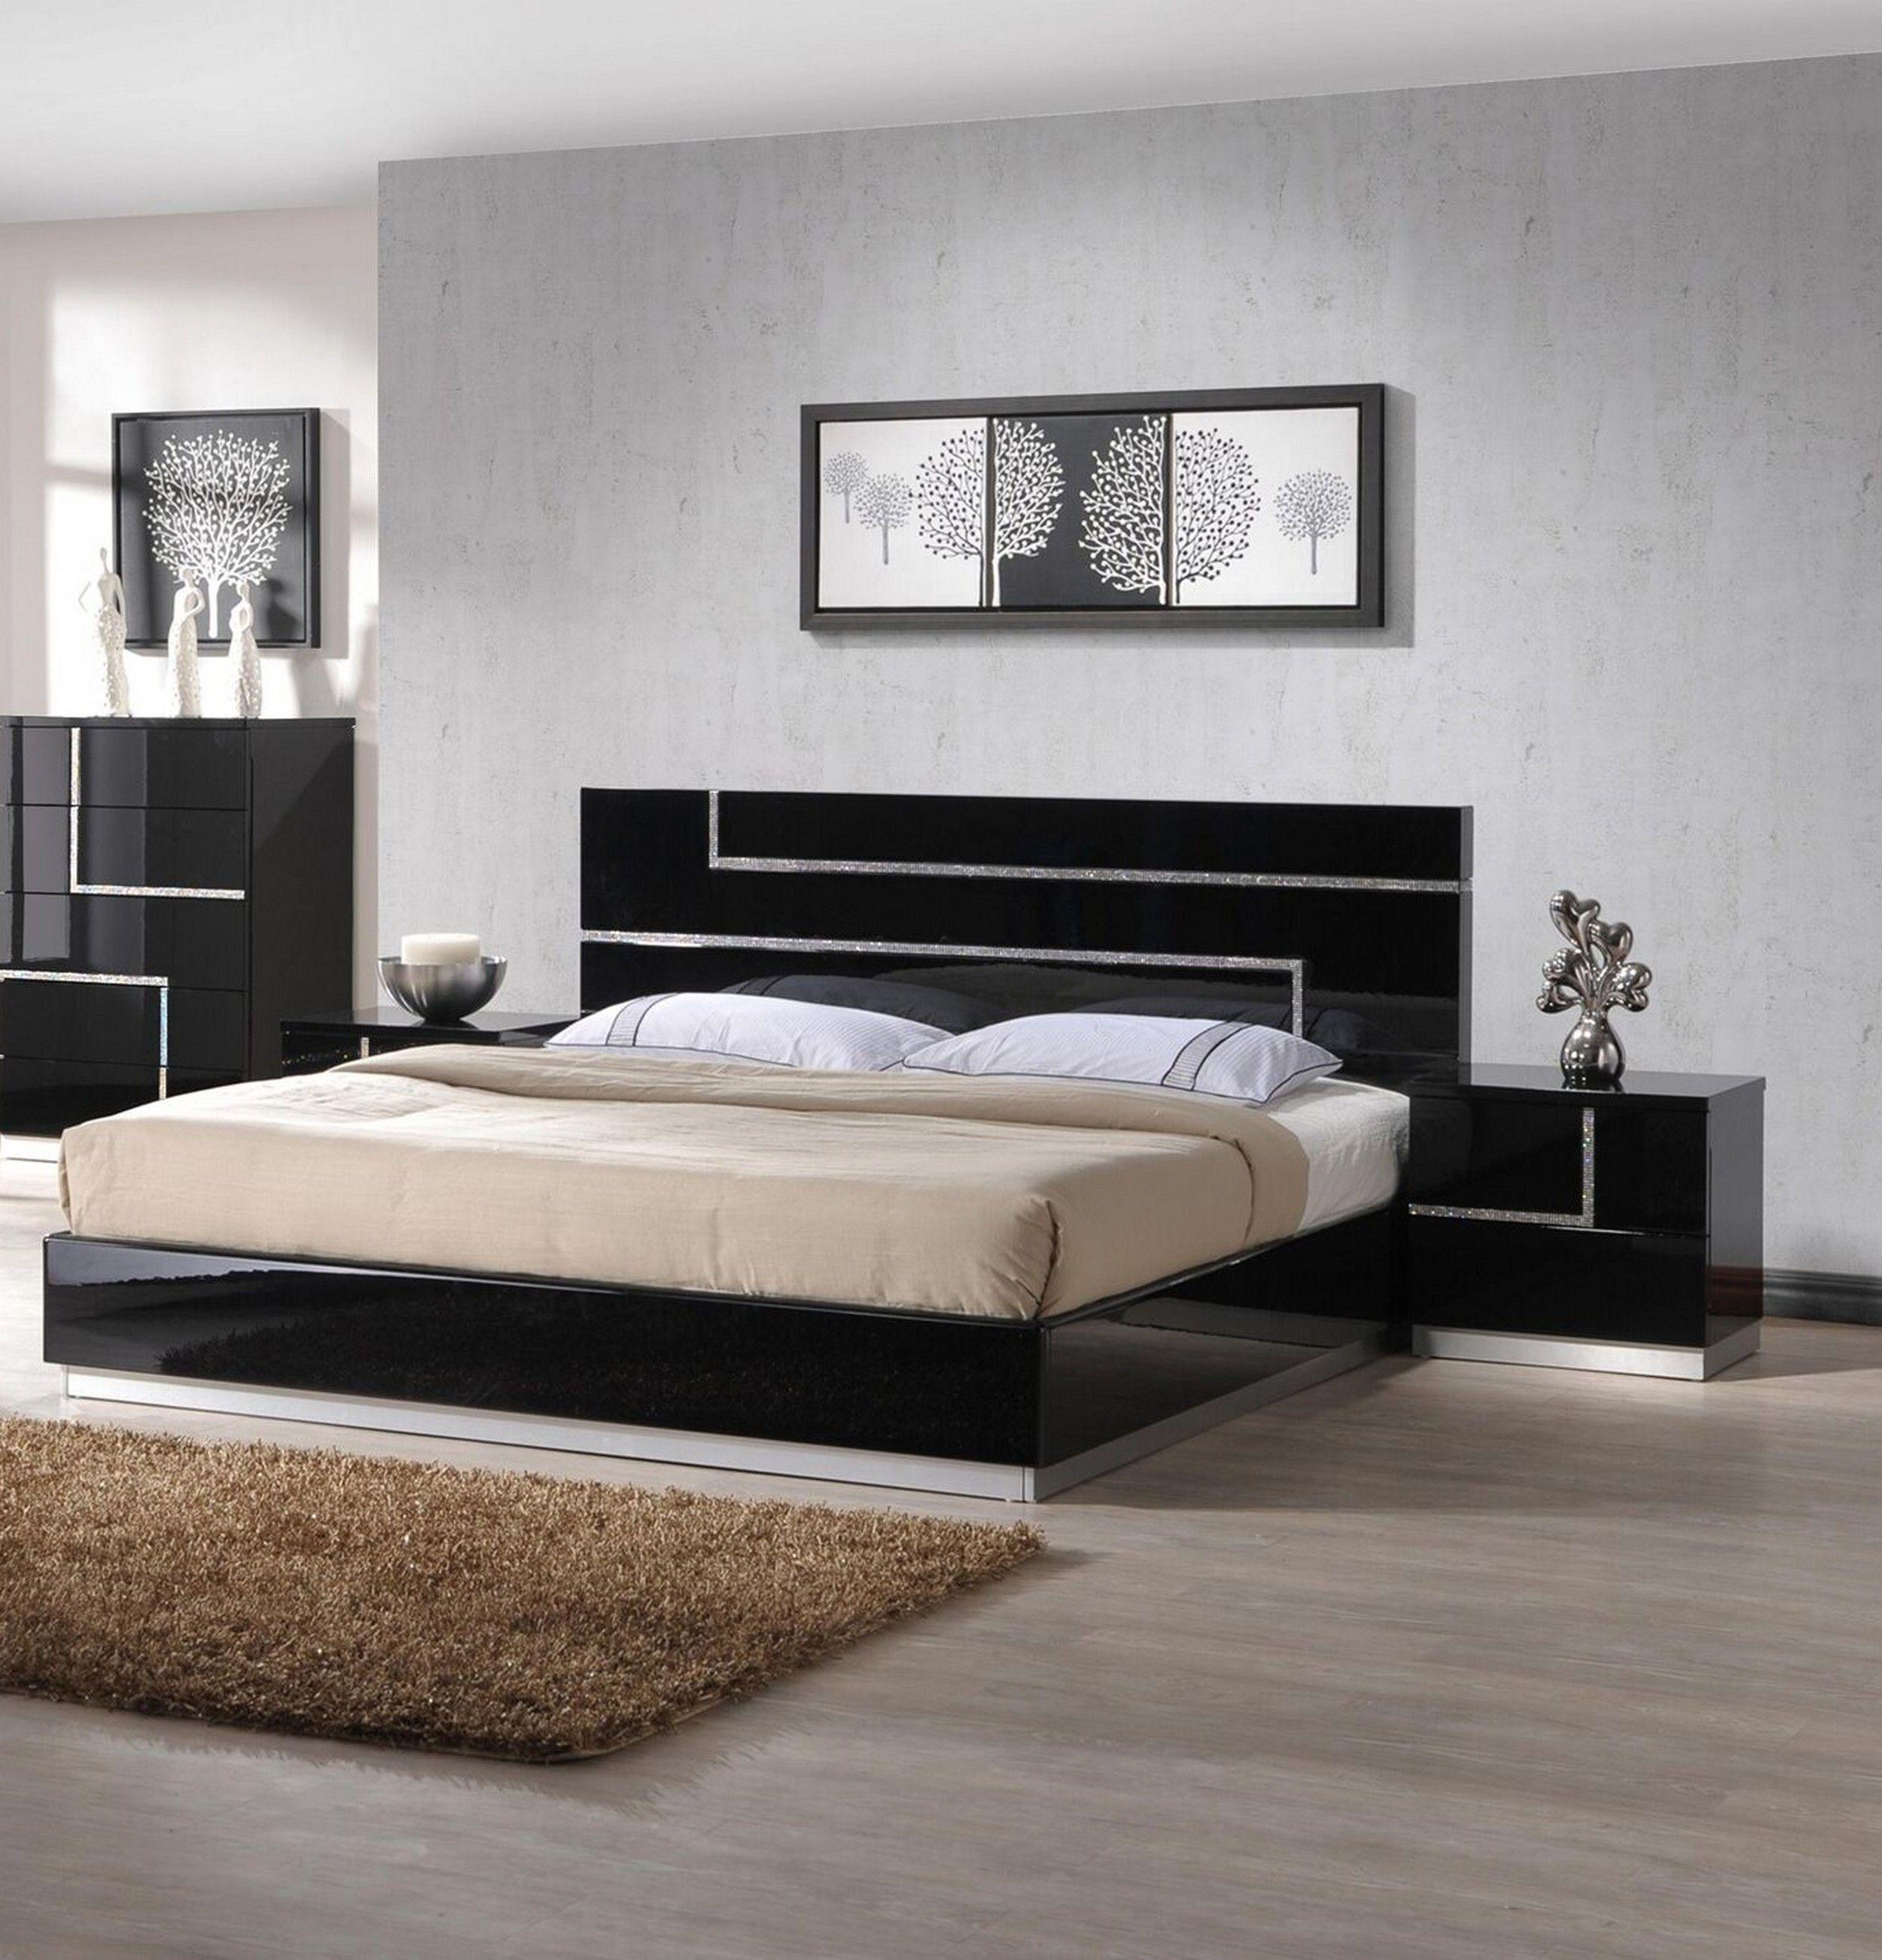 Lucca Queen Size Bed In 2020 Bedroom Furniture Design Modern